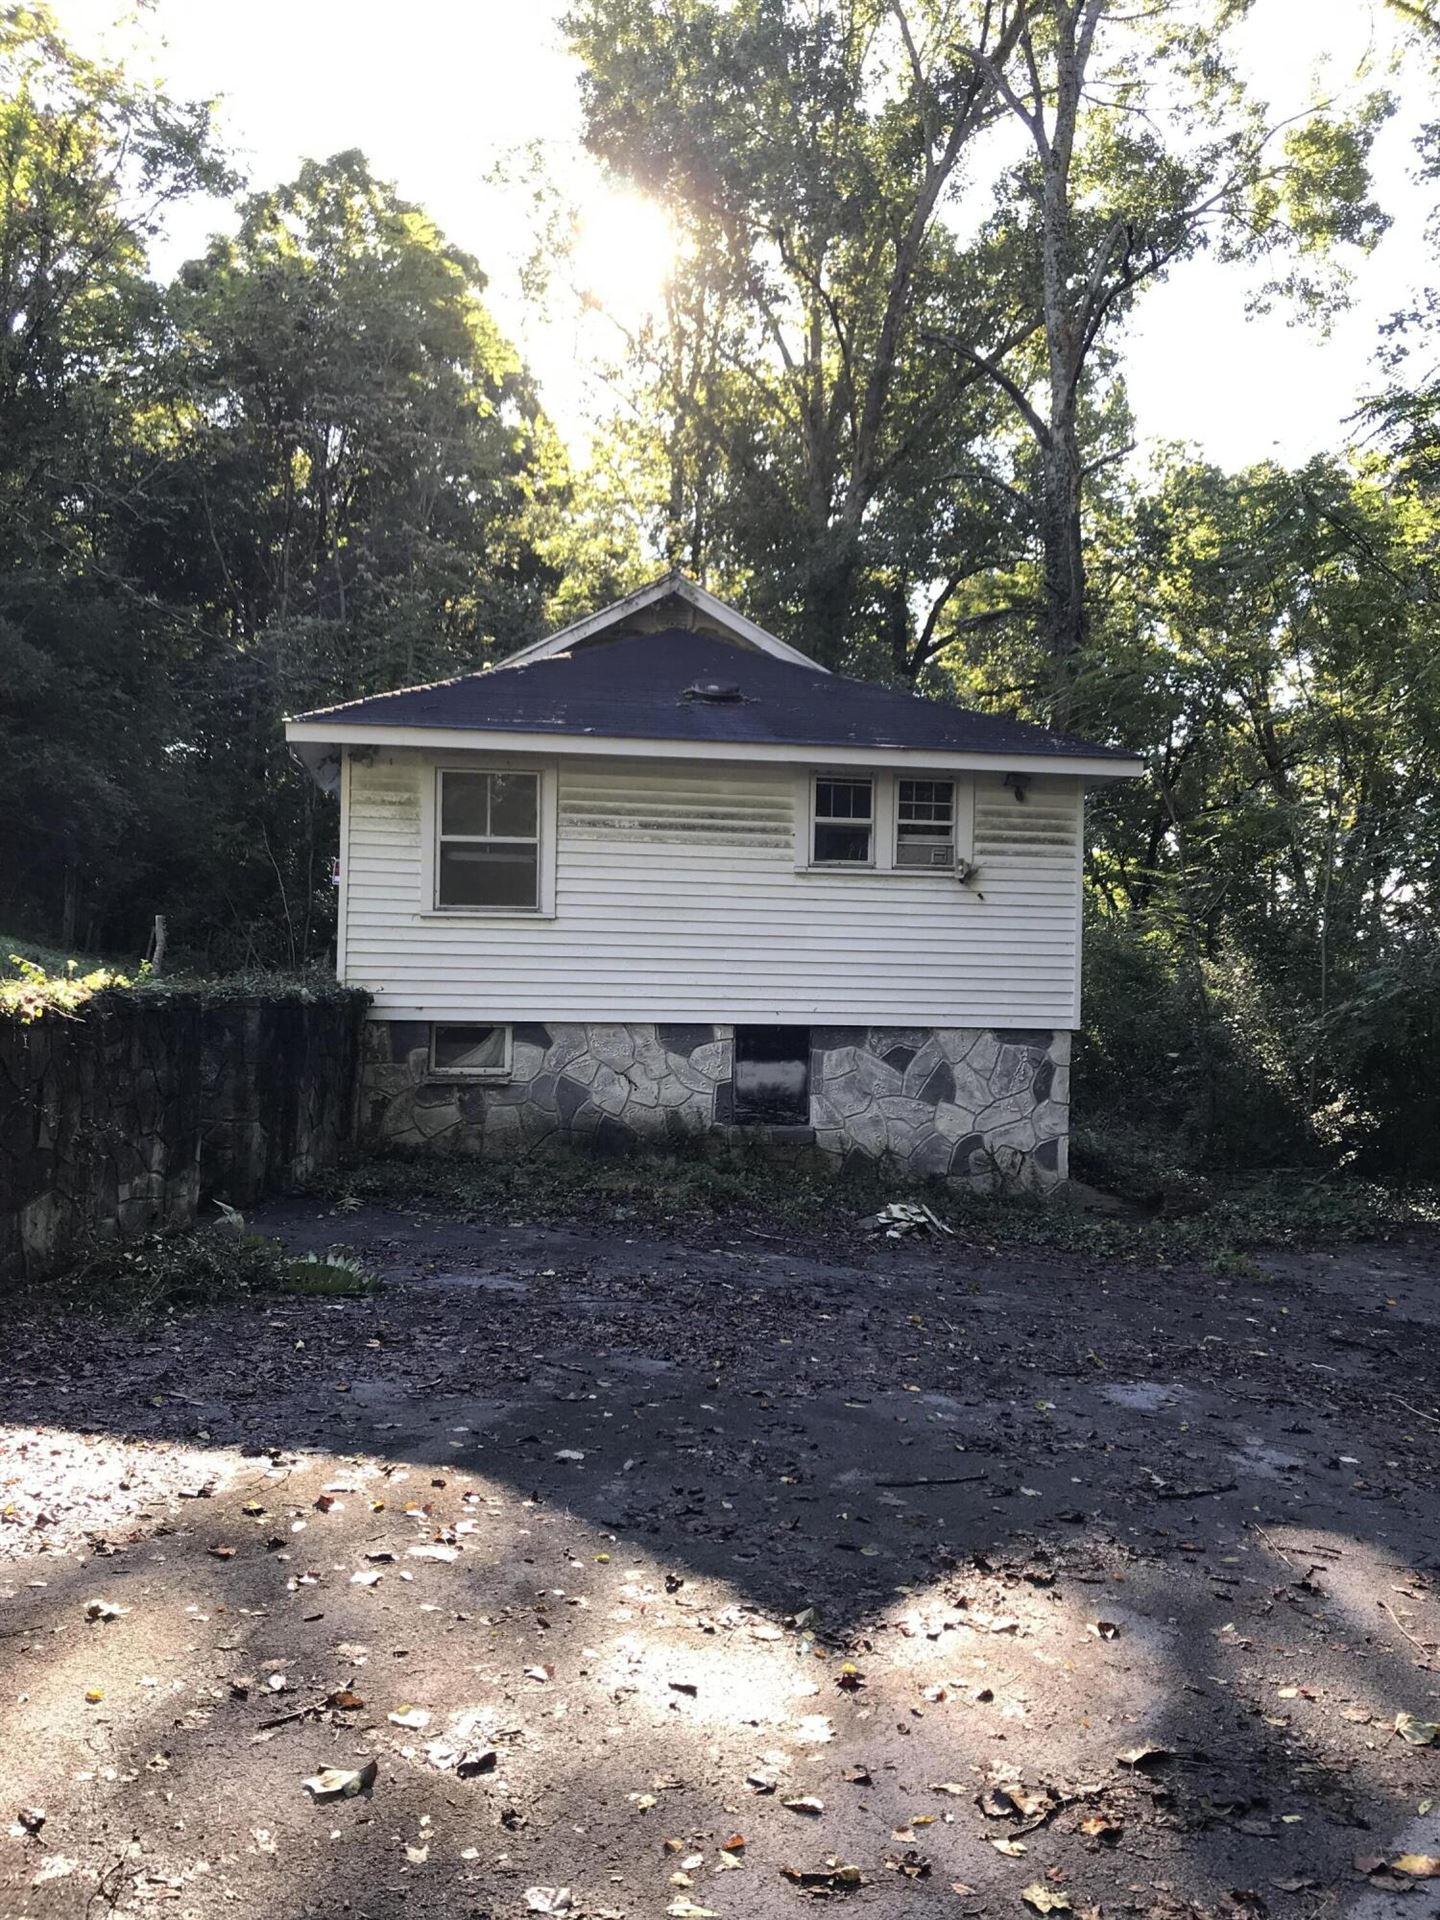 Photo of 248 Cumberland View Rd, Clinton, TN 37716 (MLS # 1169779)